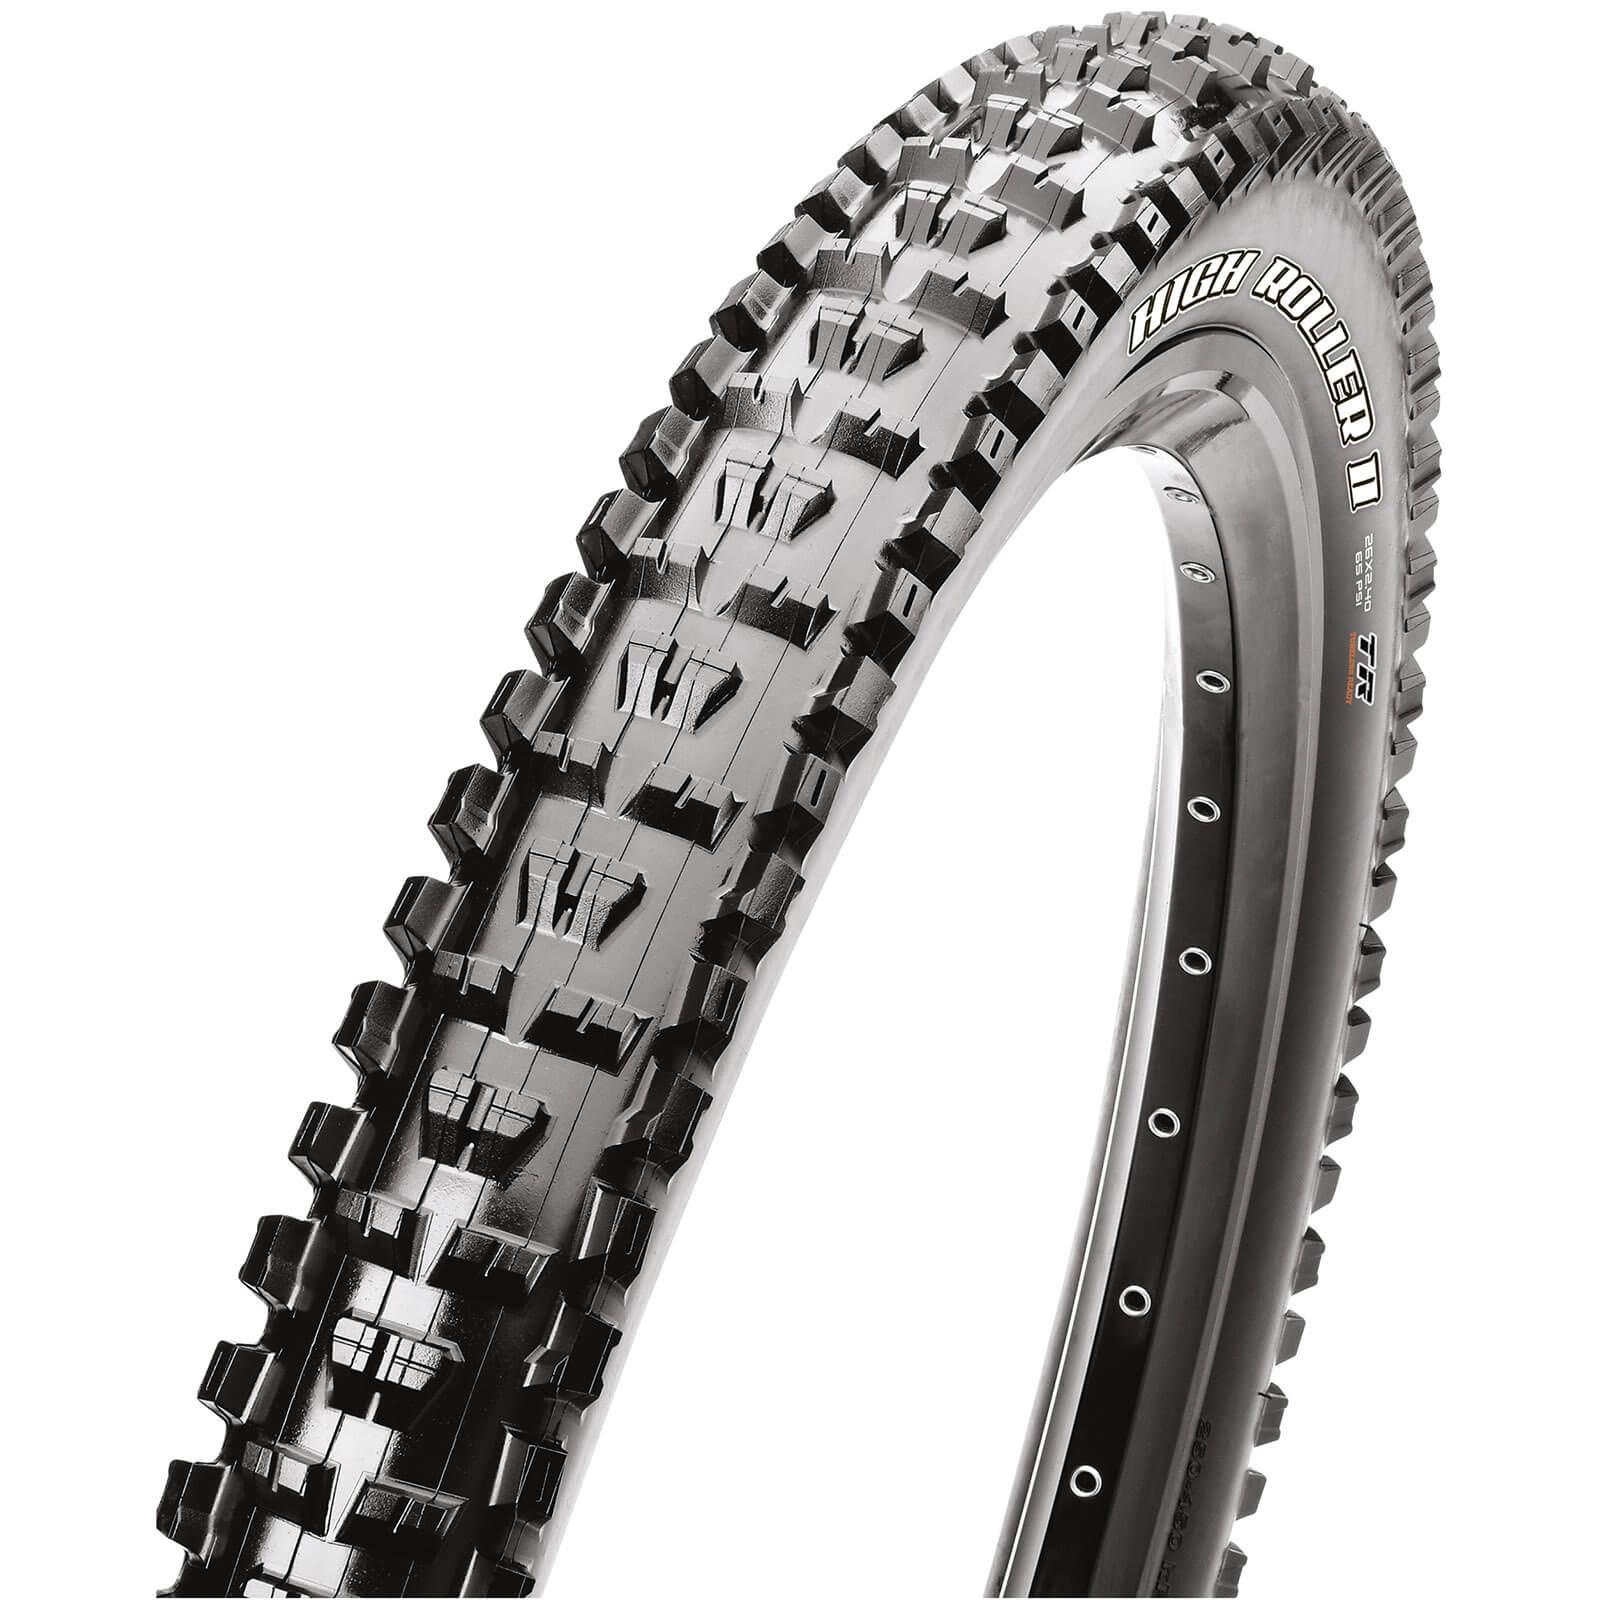 Maxxis High Roller II+ Folding TR EXO Tyre - 27.5in x 3.00in